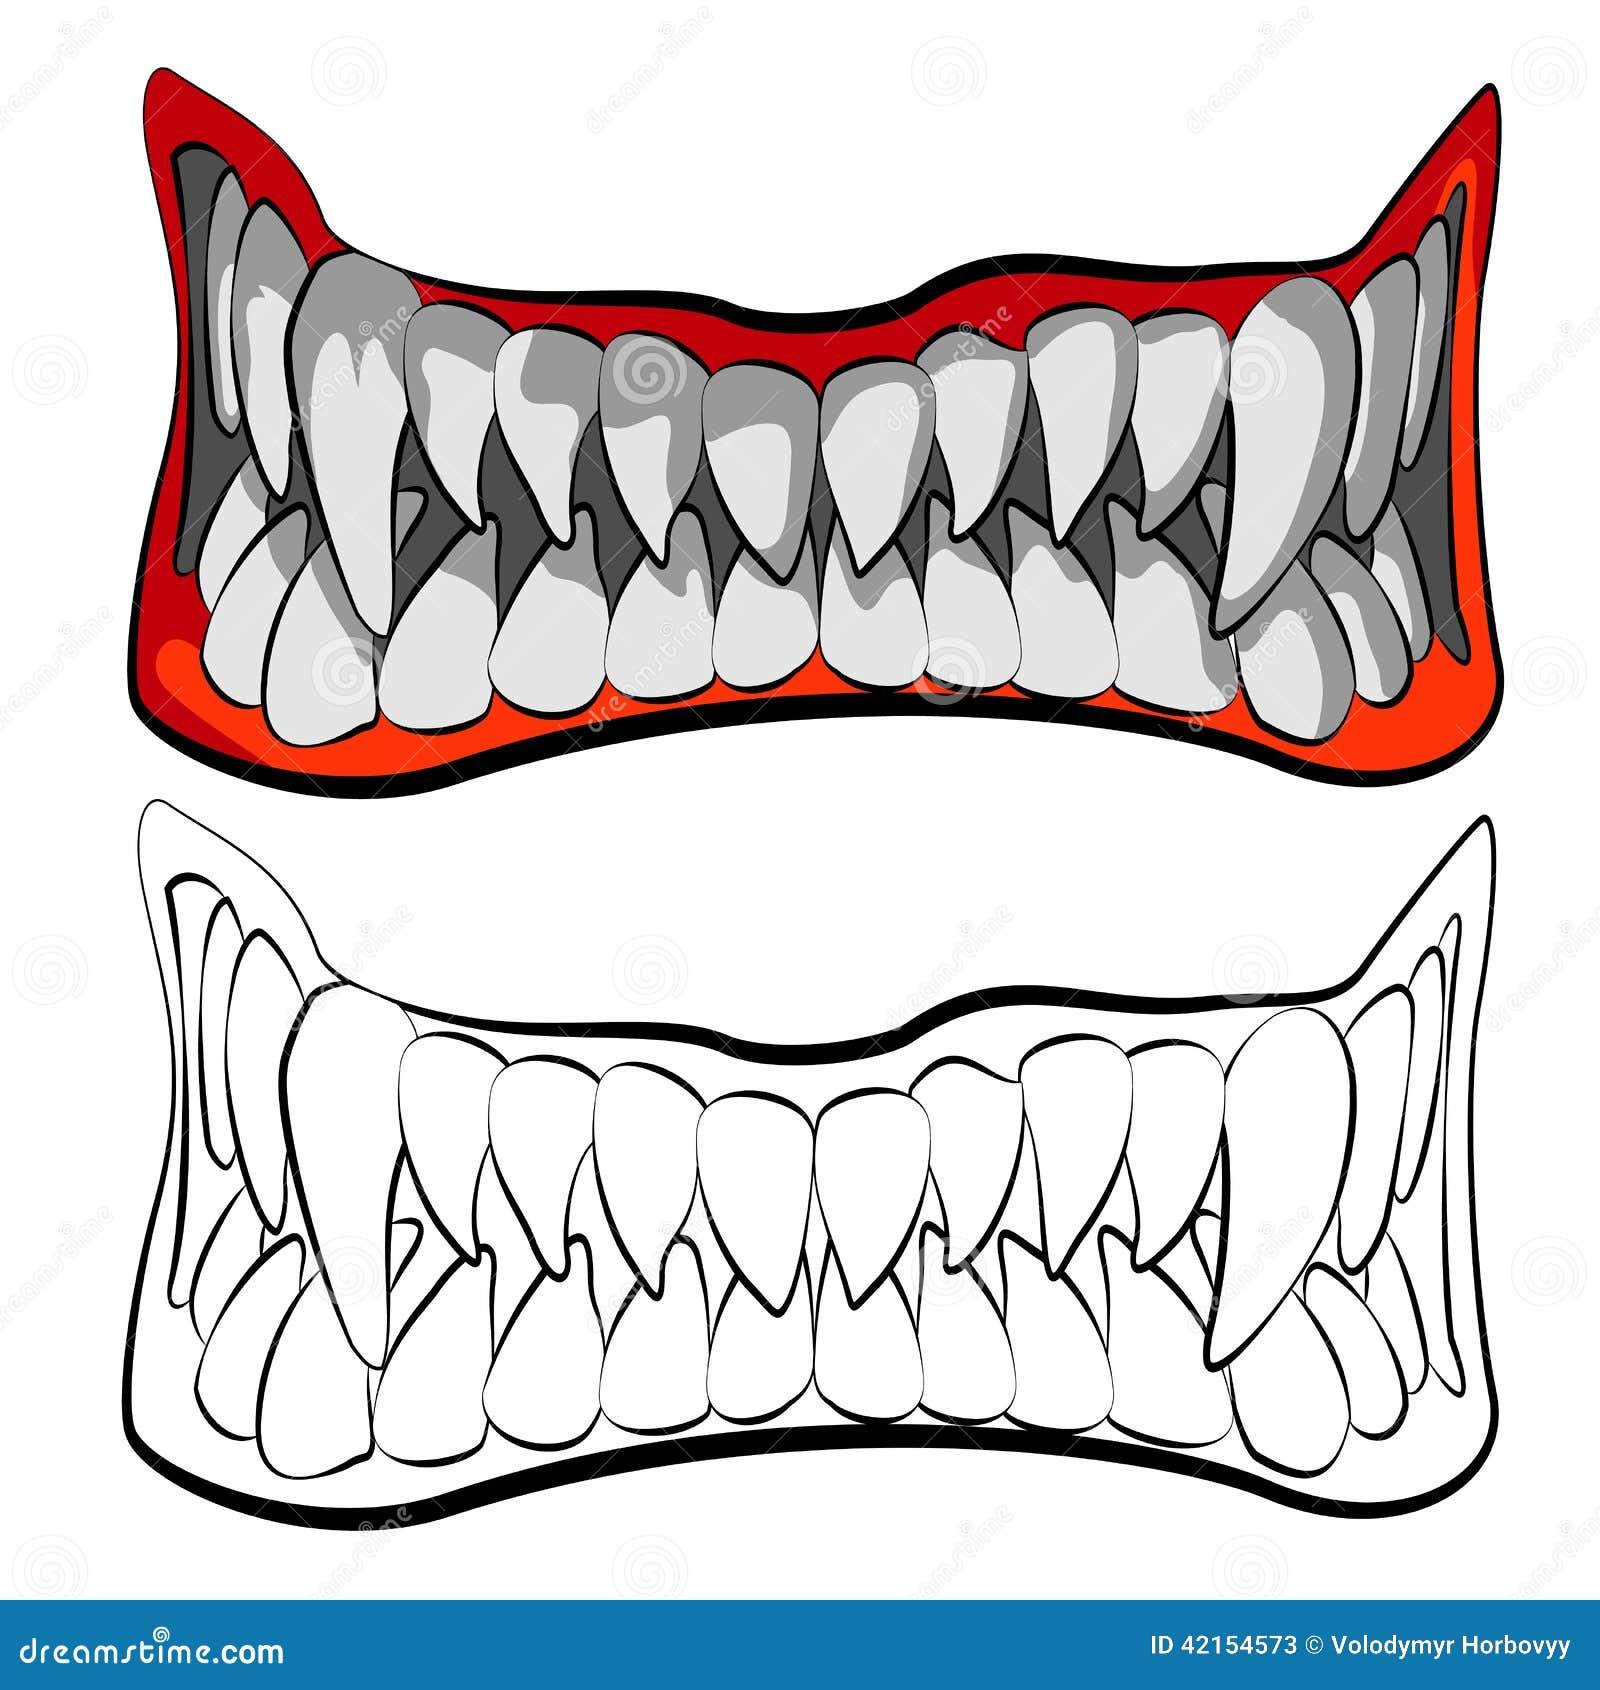 The jaws stock vector. Image of danger, closeup, dental ...